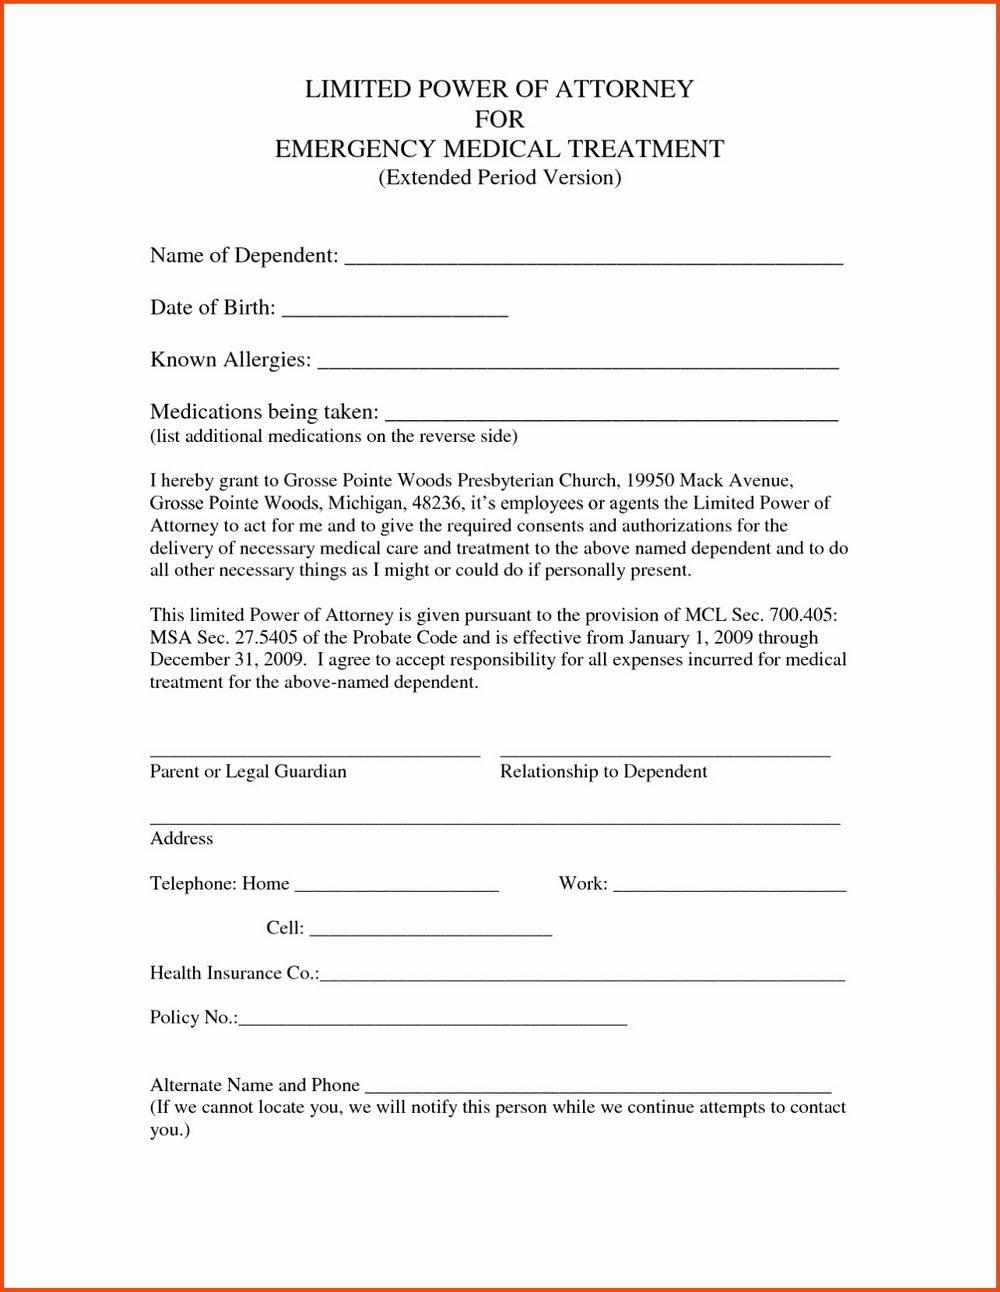 Arizona Power Of Attorney Forms